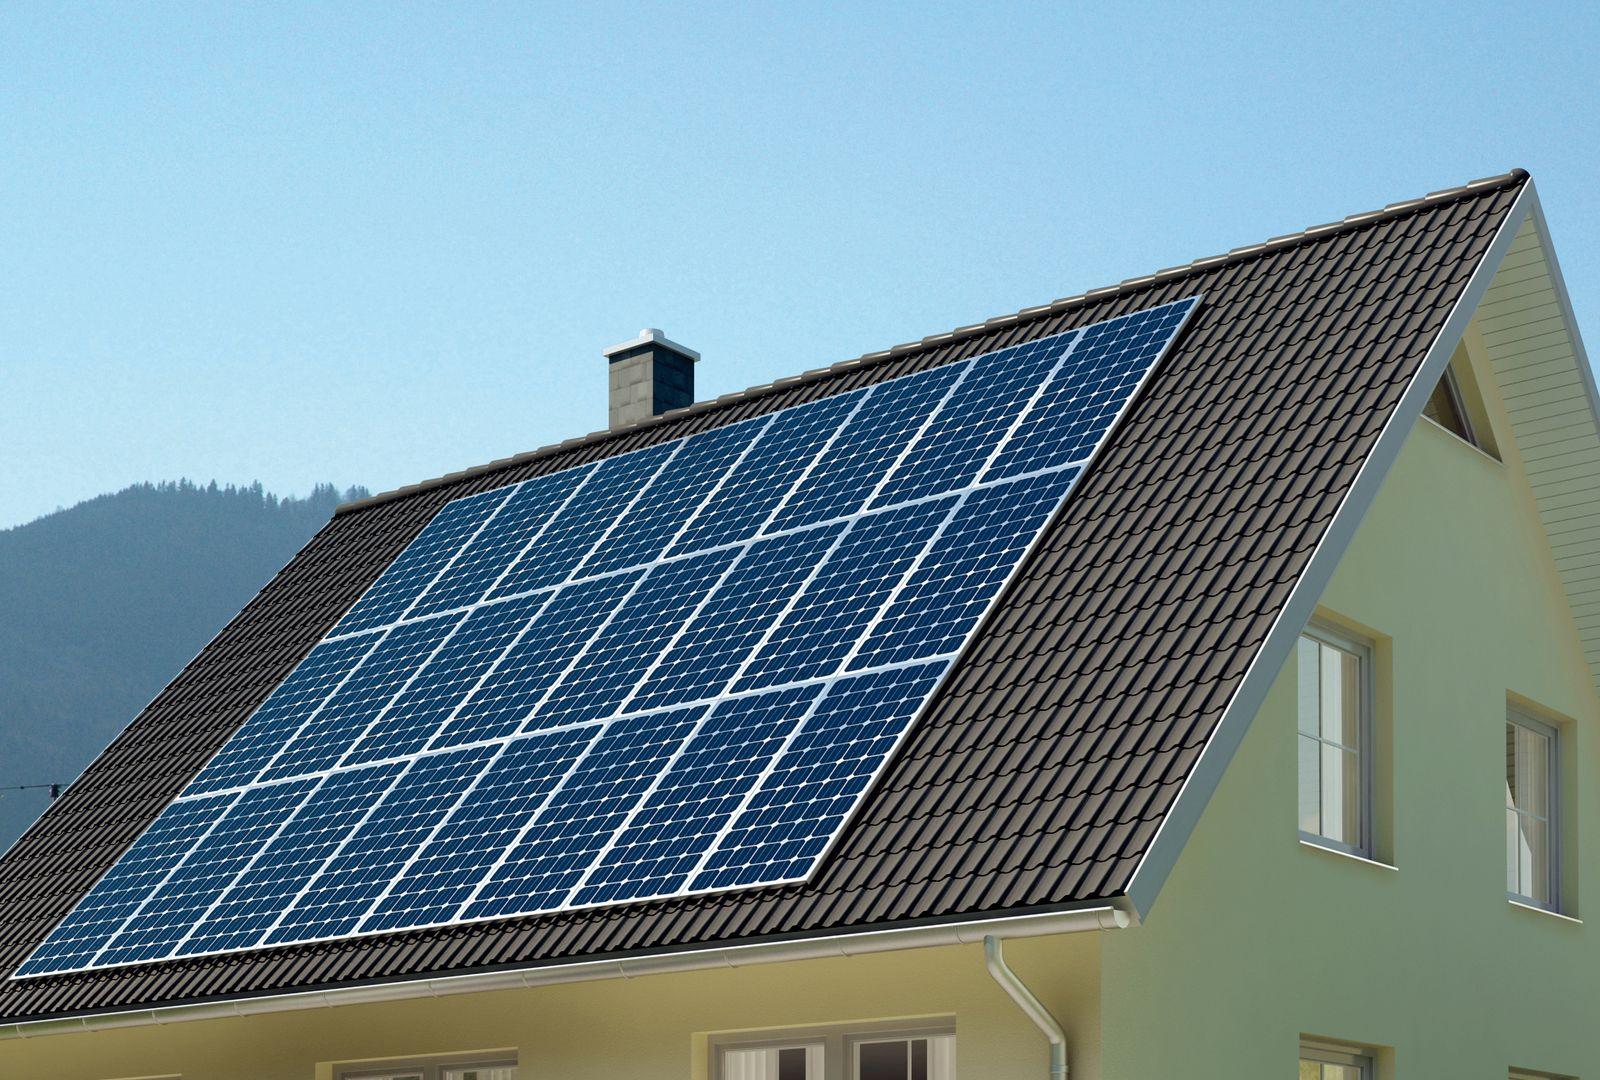 Solarenergie / Photovoltaik-Anlage